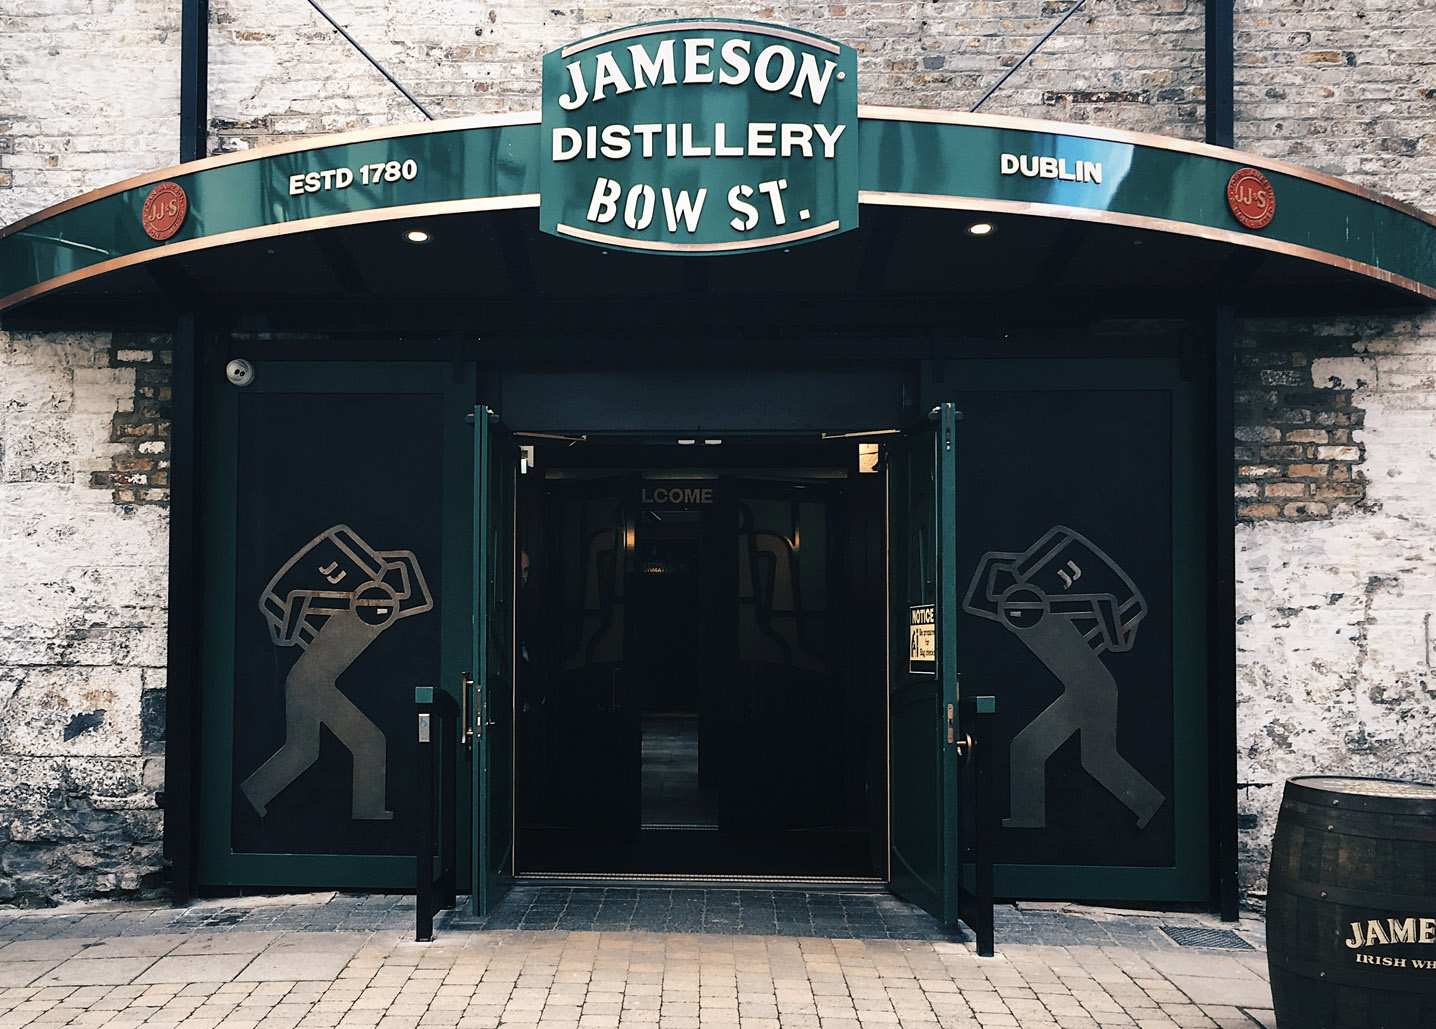 Jameson Bow St 18 Cask Strength - Todo Whisky